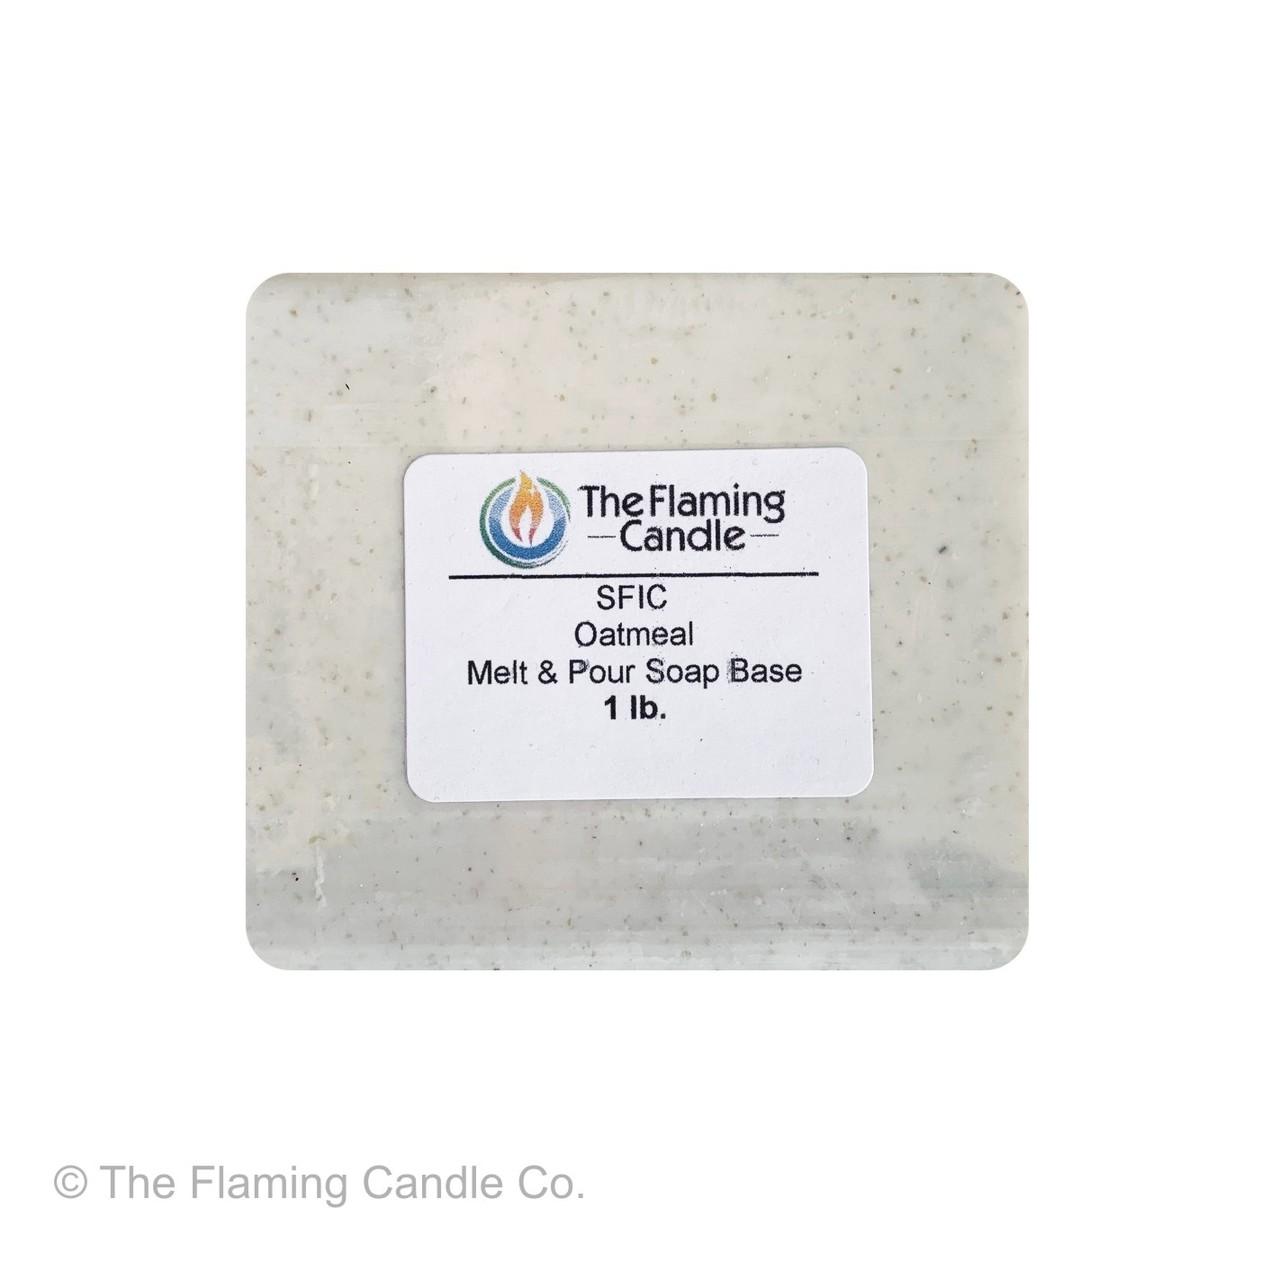 Palm FREE Melt and Pour Soap Base SLS free SFIC